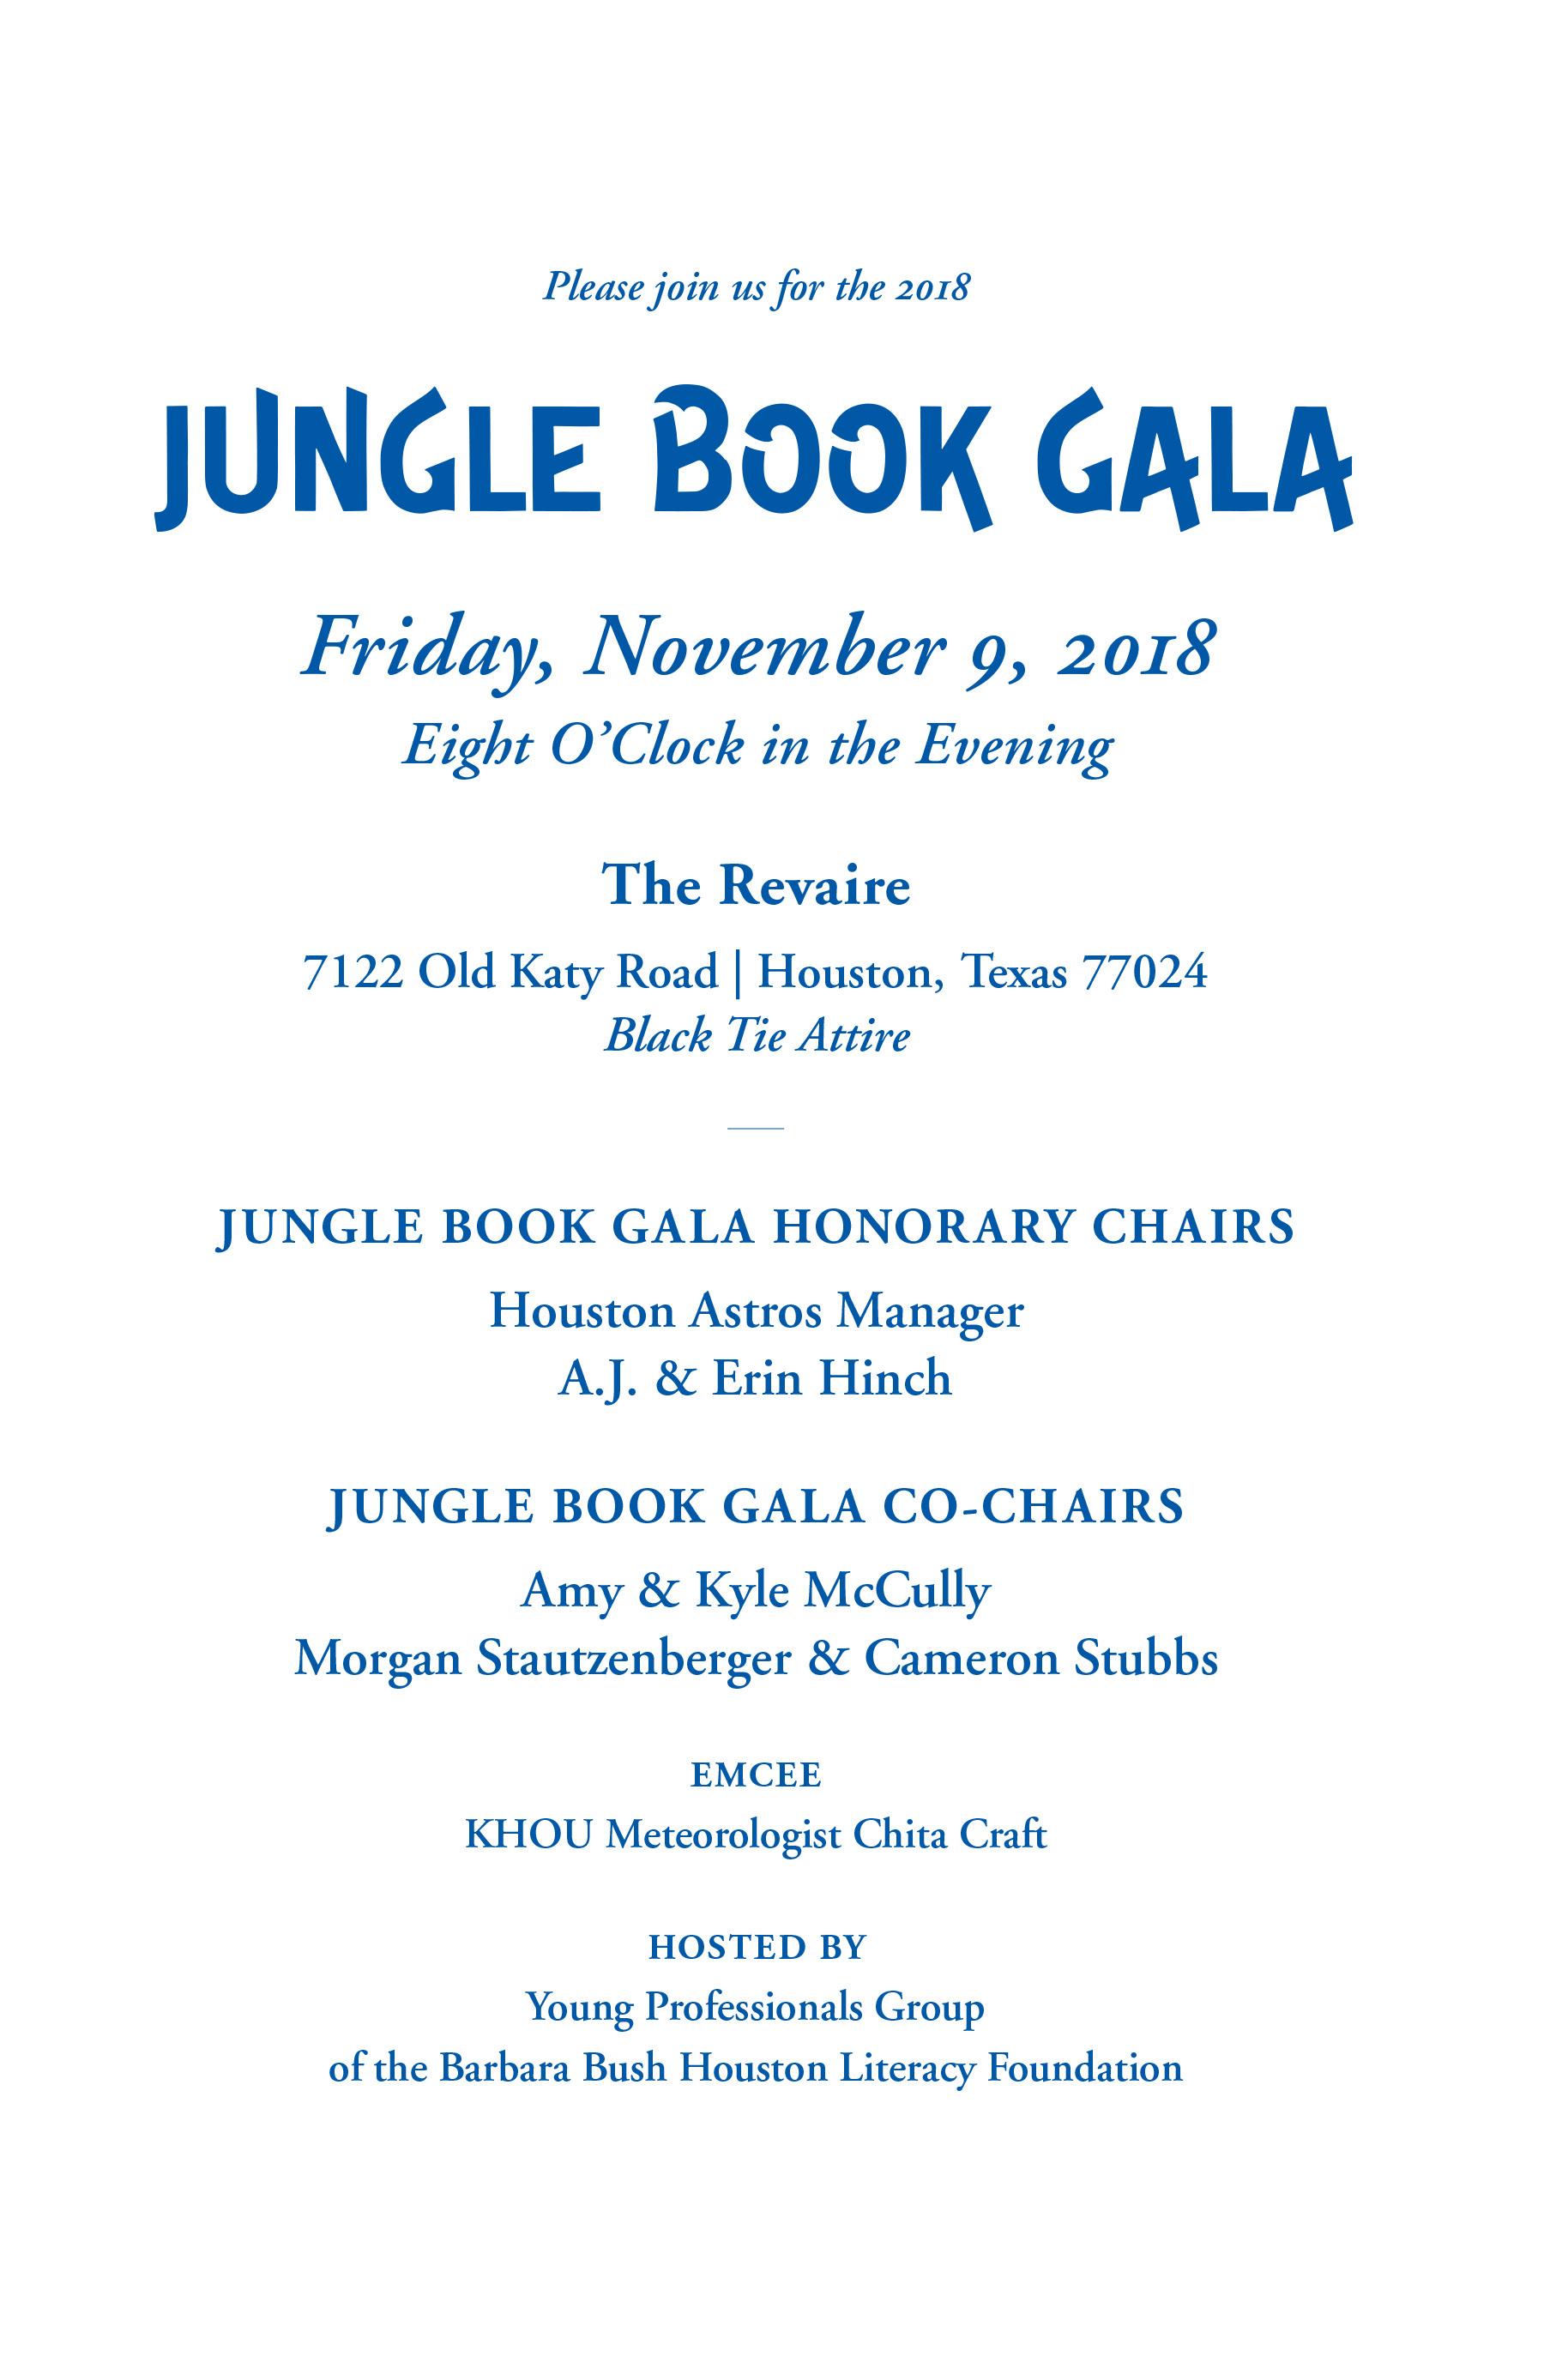 Jungle Book Gala - digital invitation_Page_2.jpg